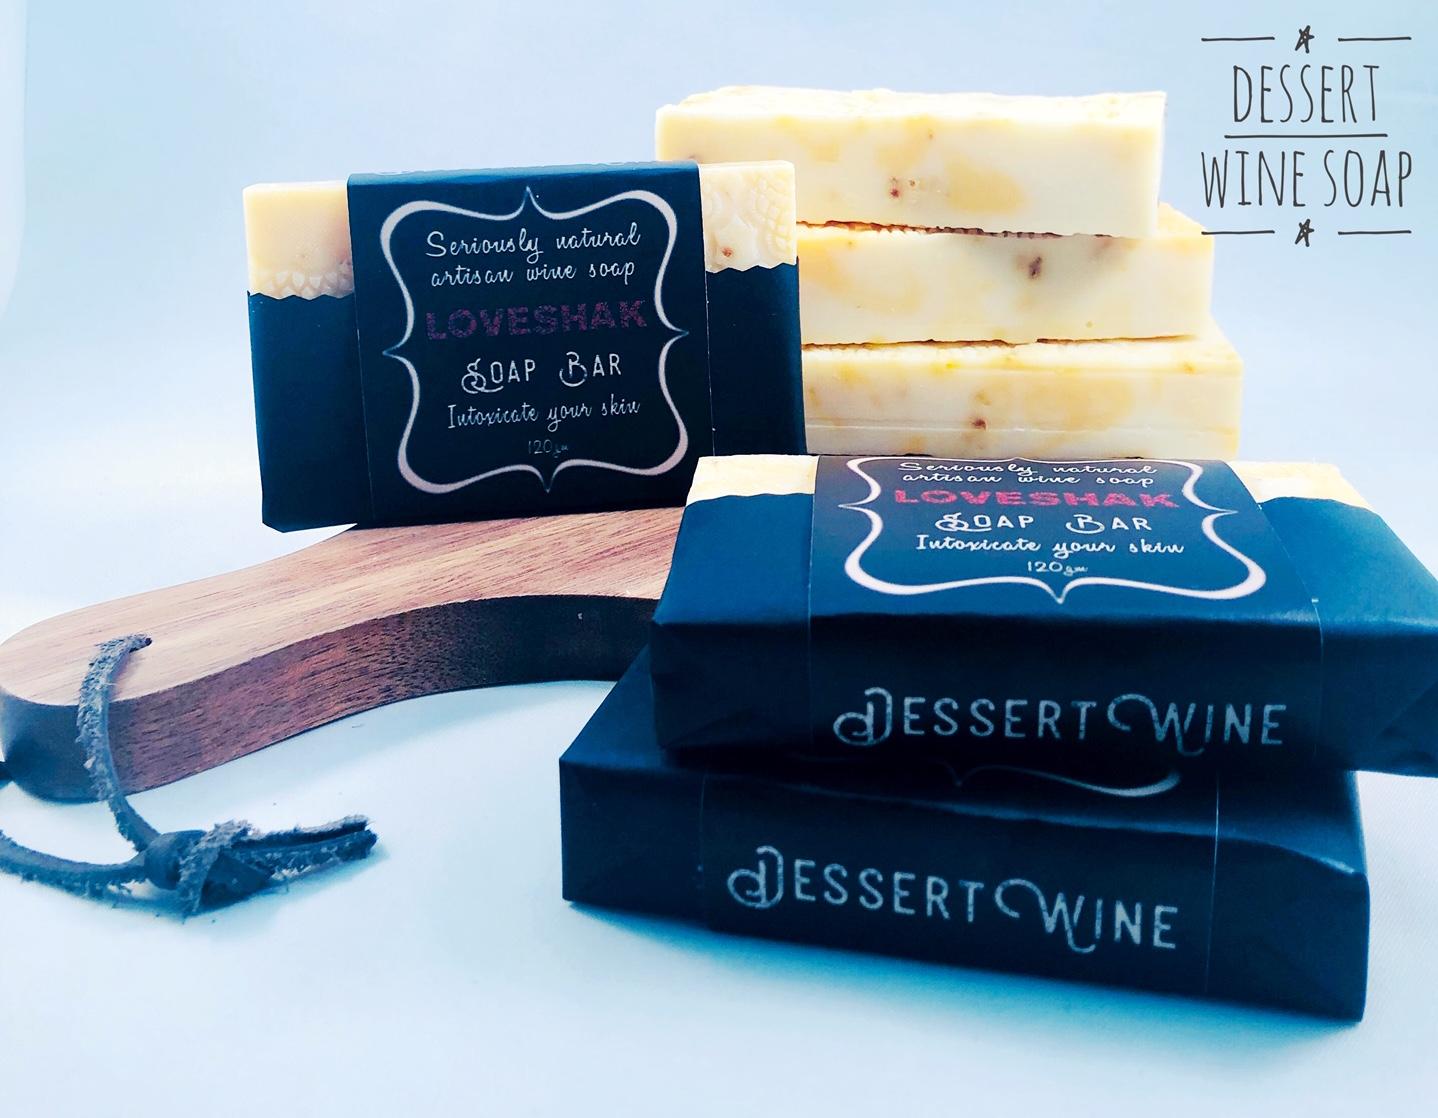 dessert wine soap (2).jpg